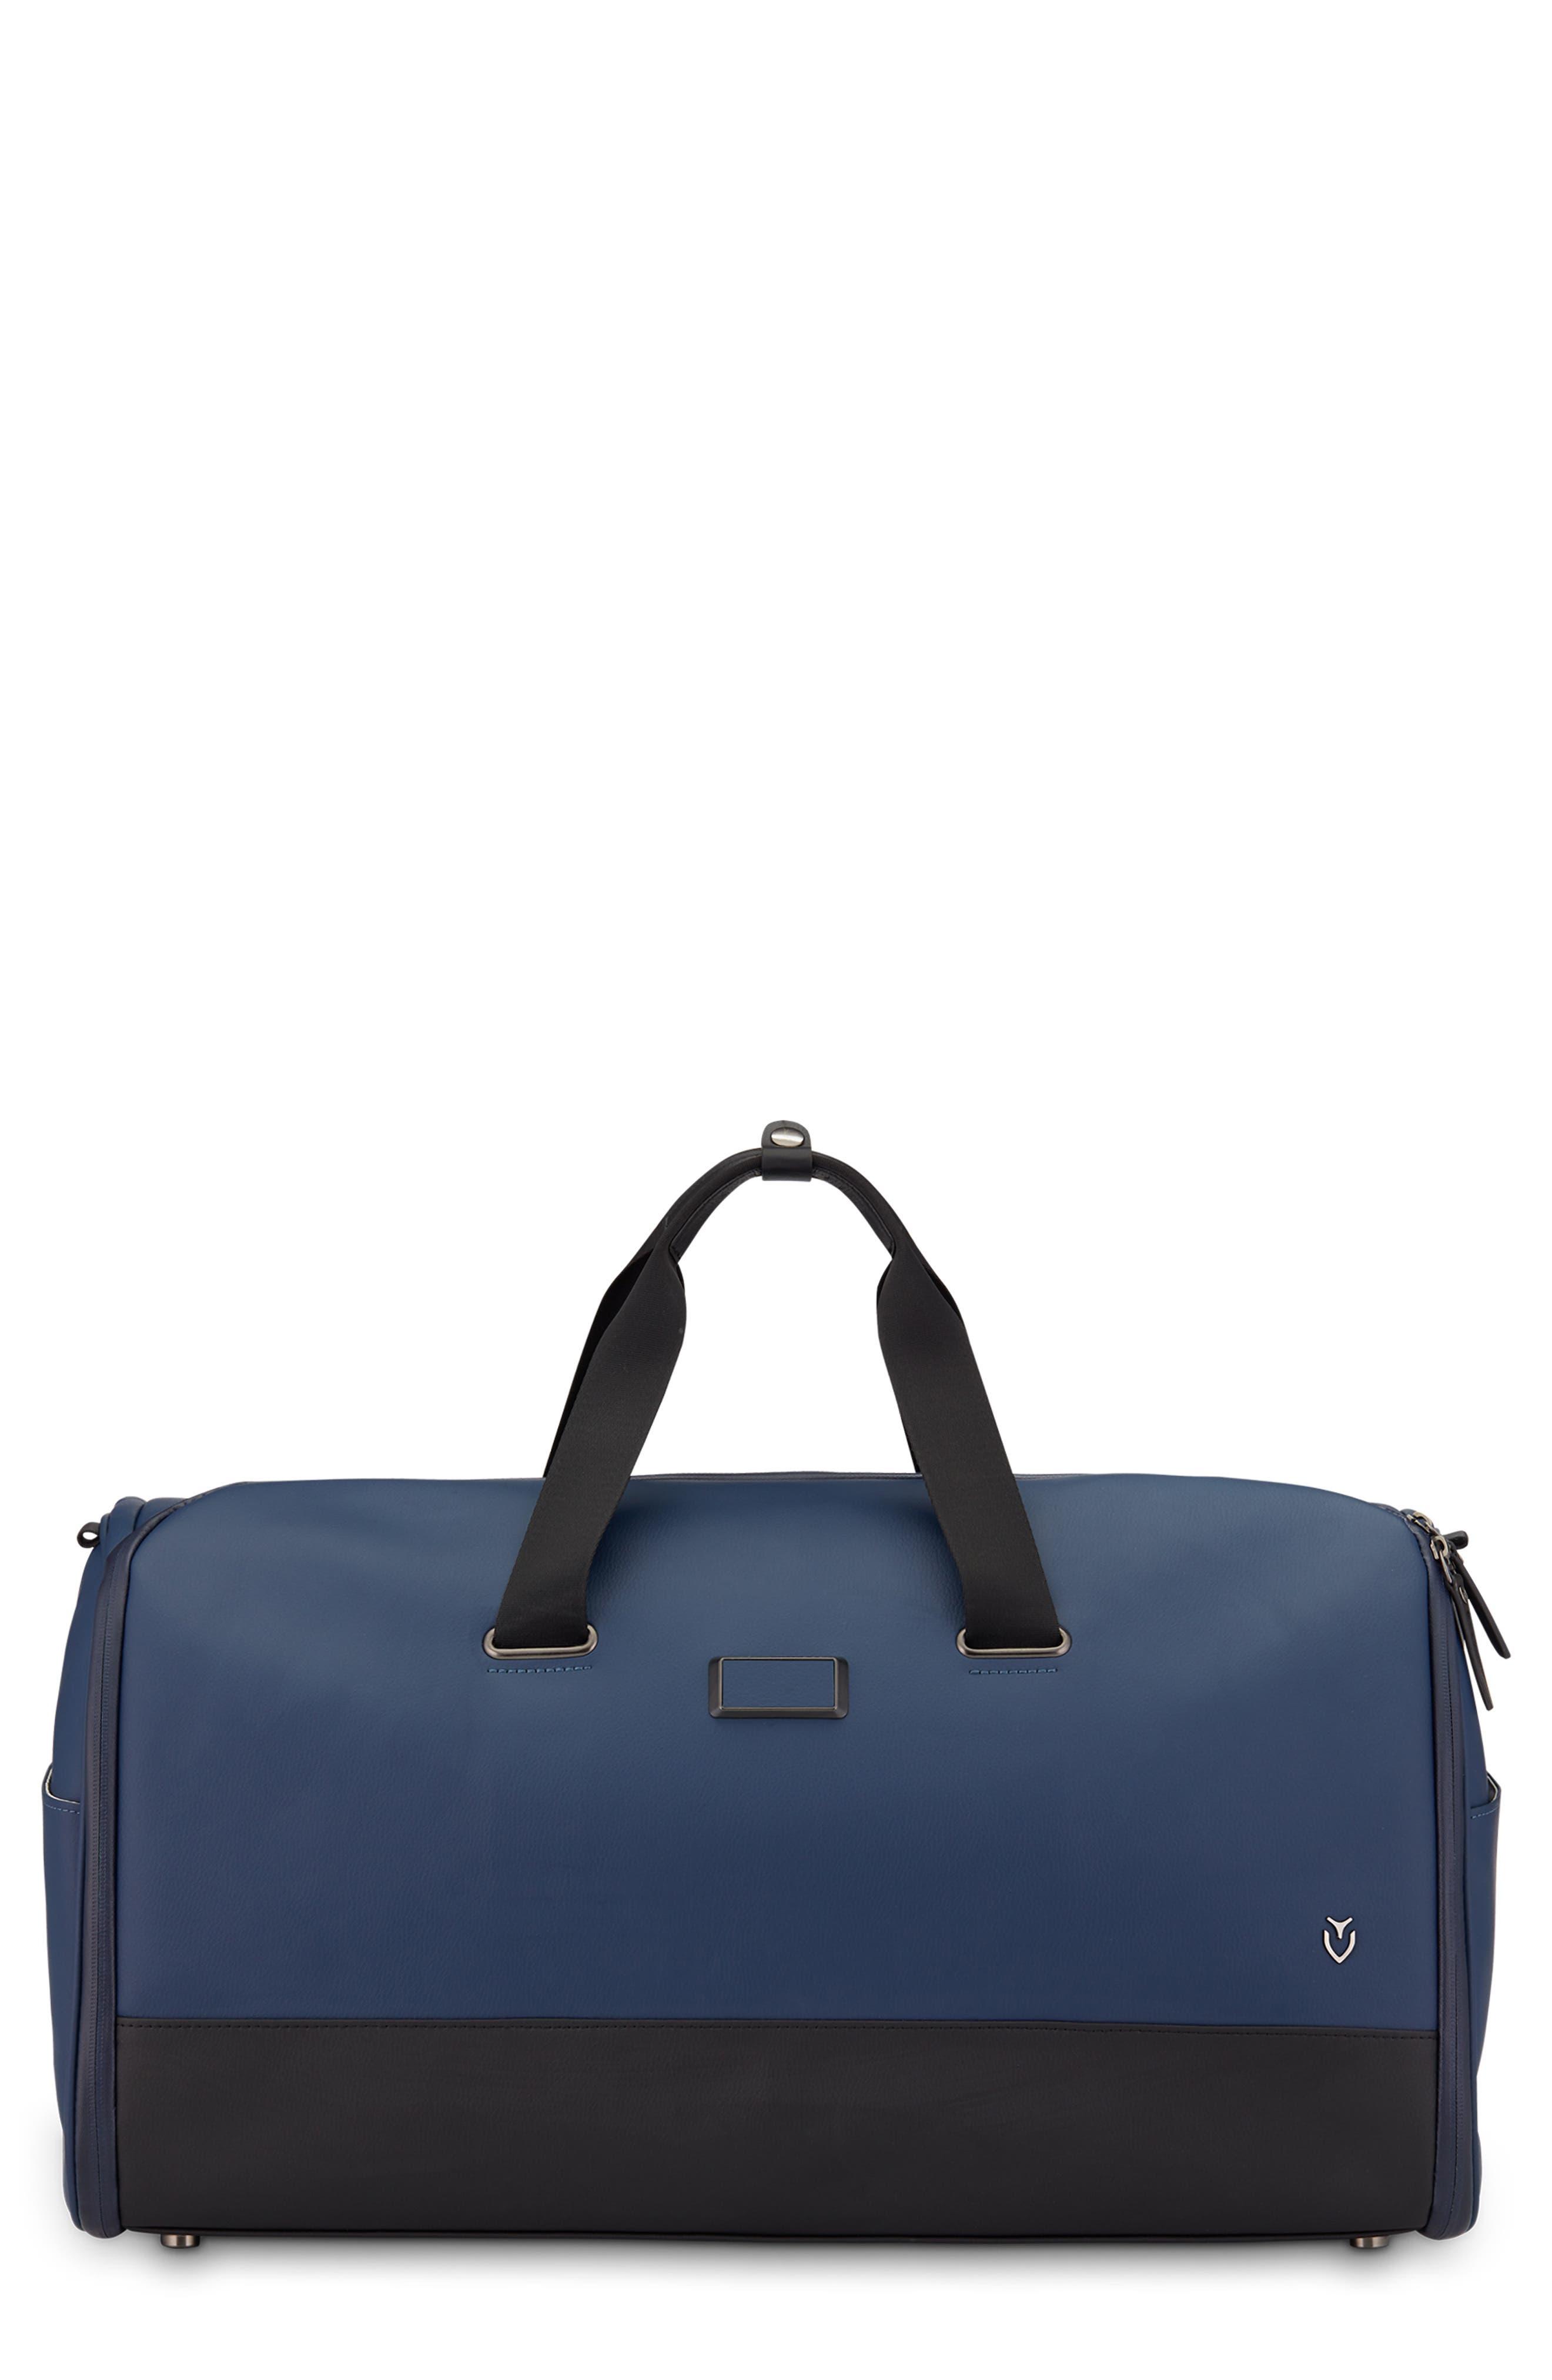 Signature 2.0 Garment Duffle Bag